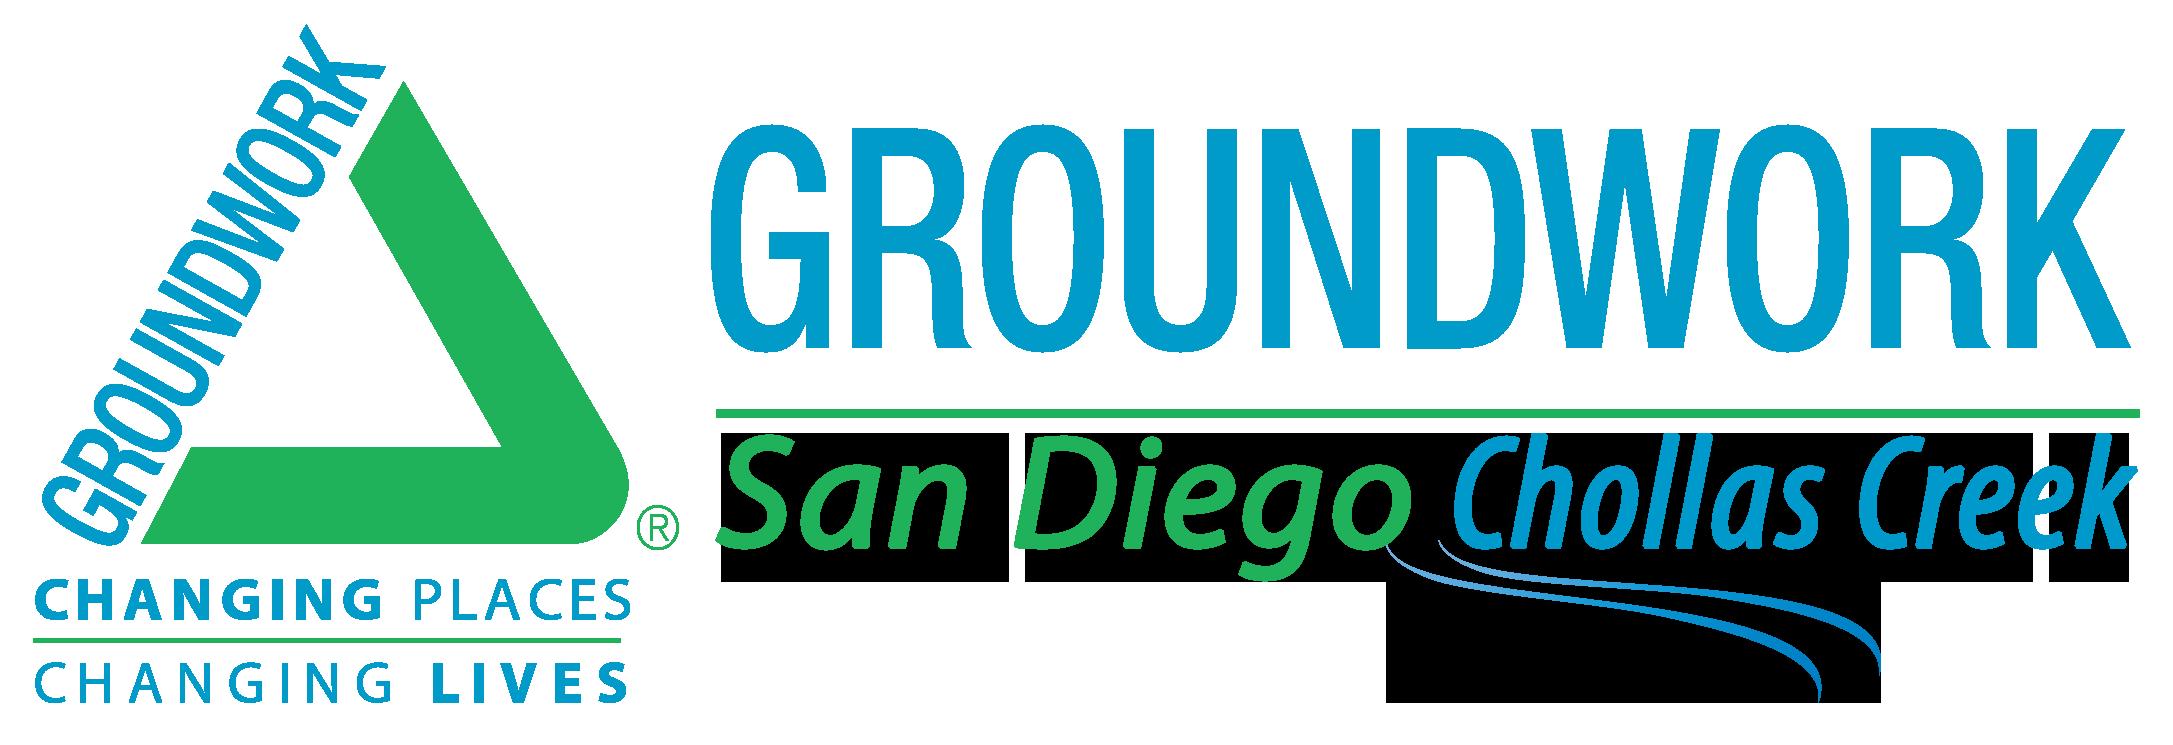 Groundwork San Diego - Chollas Creek